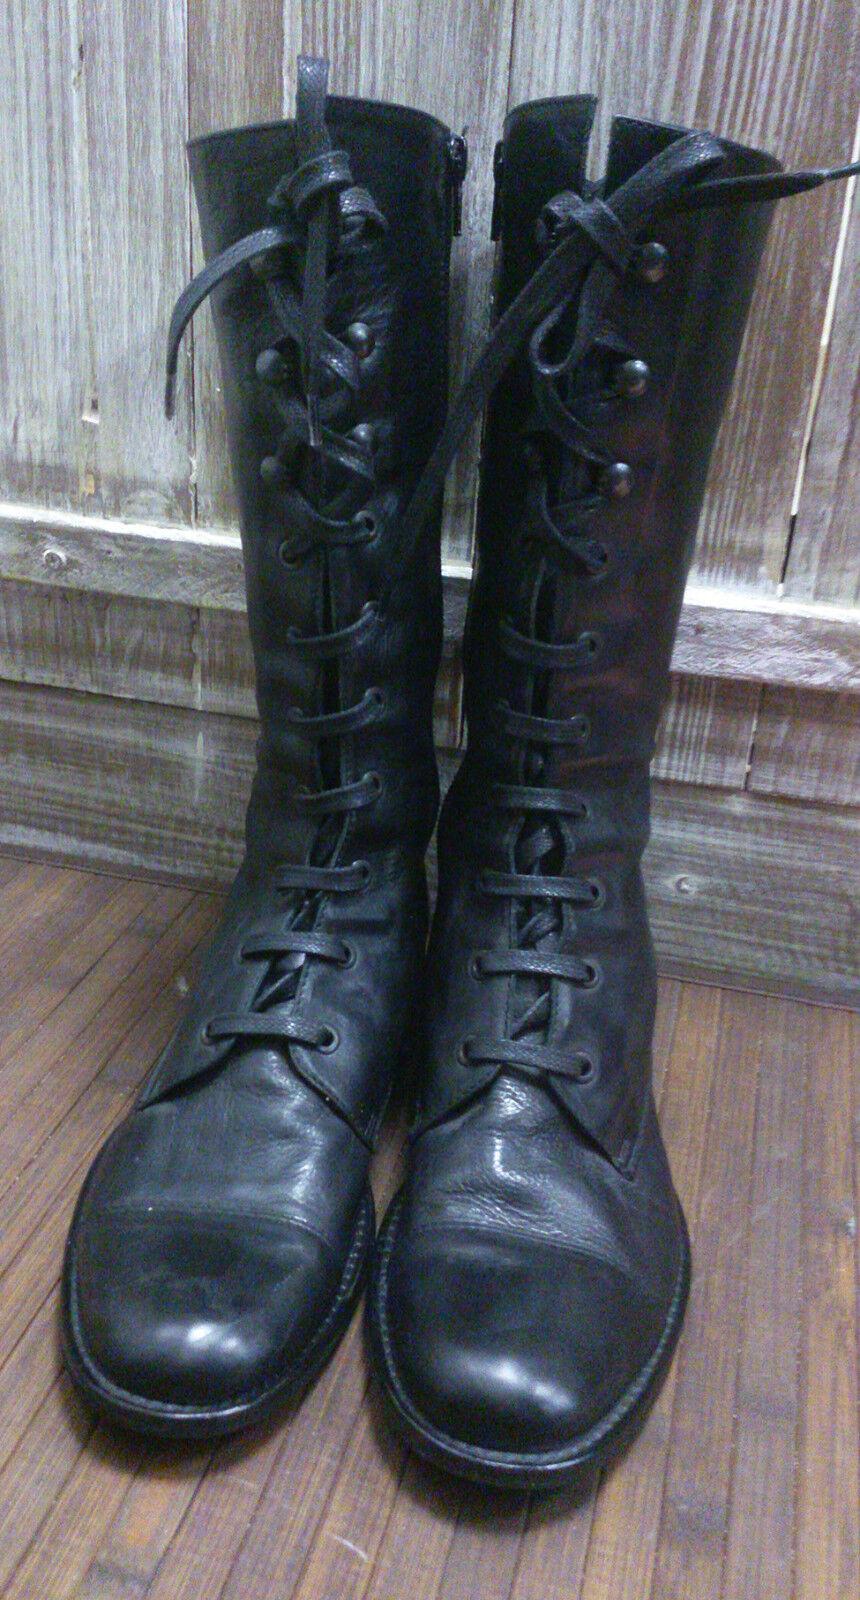 botas botas botas SIMON BAY  tout cuir pointure 36,5 62833c